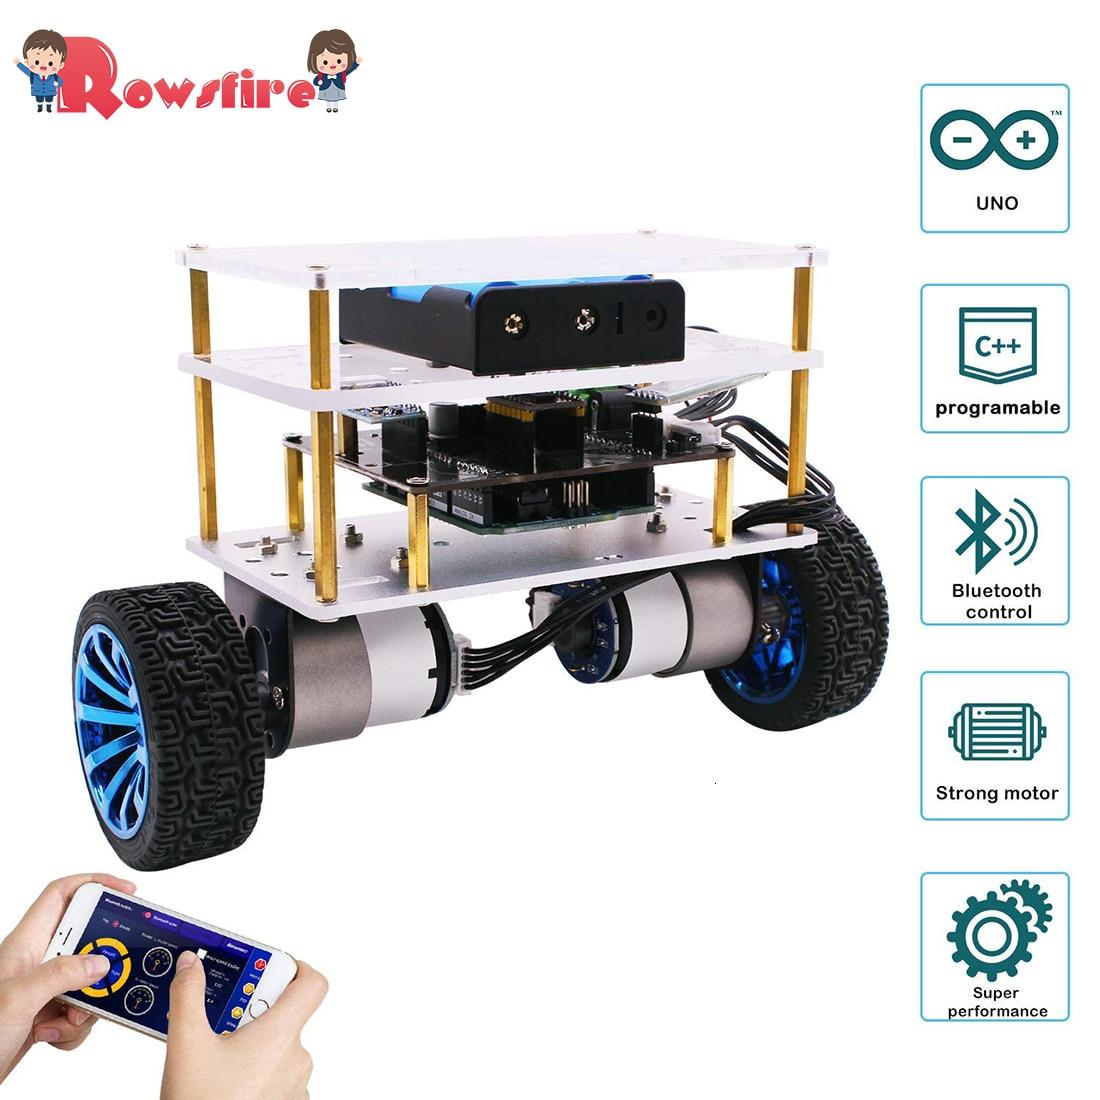 2019 New Balance Robot Car Compatible For Arduino Electronics Programmable High Tech Robotics Support C Language Kids Adult